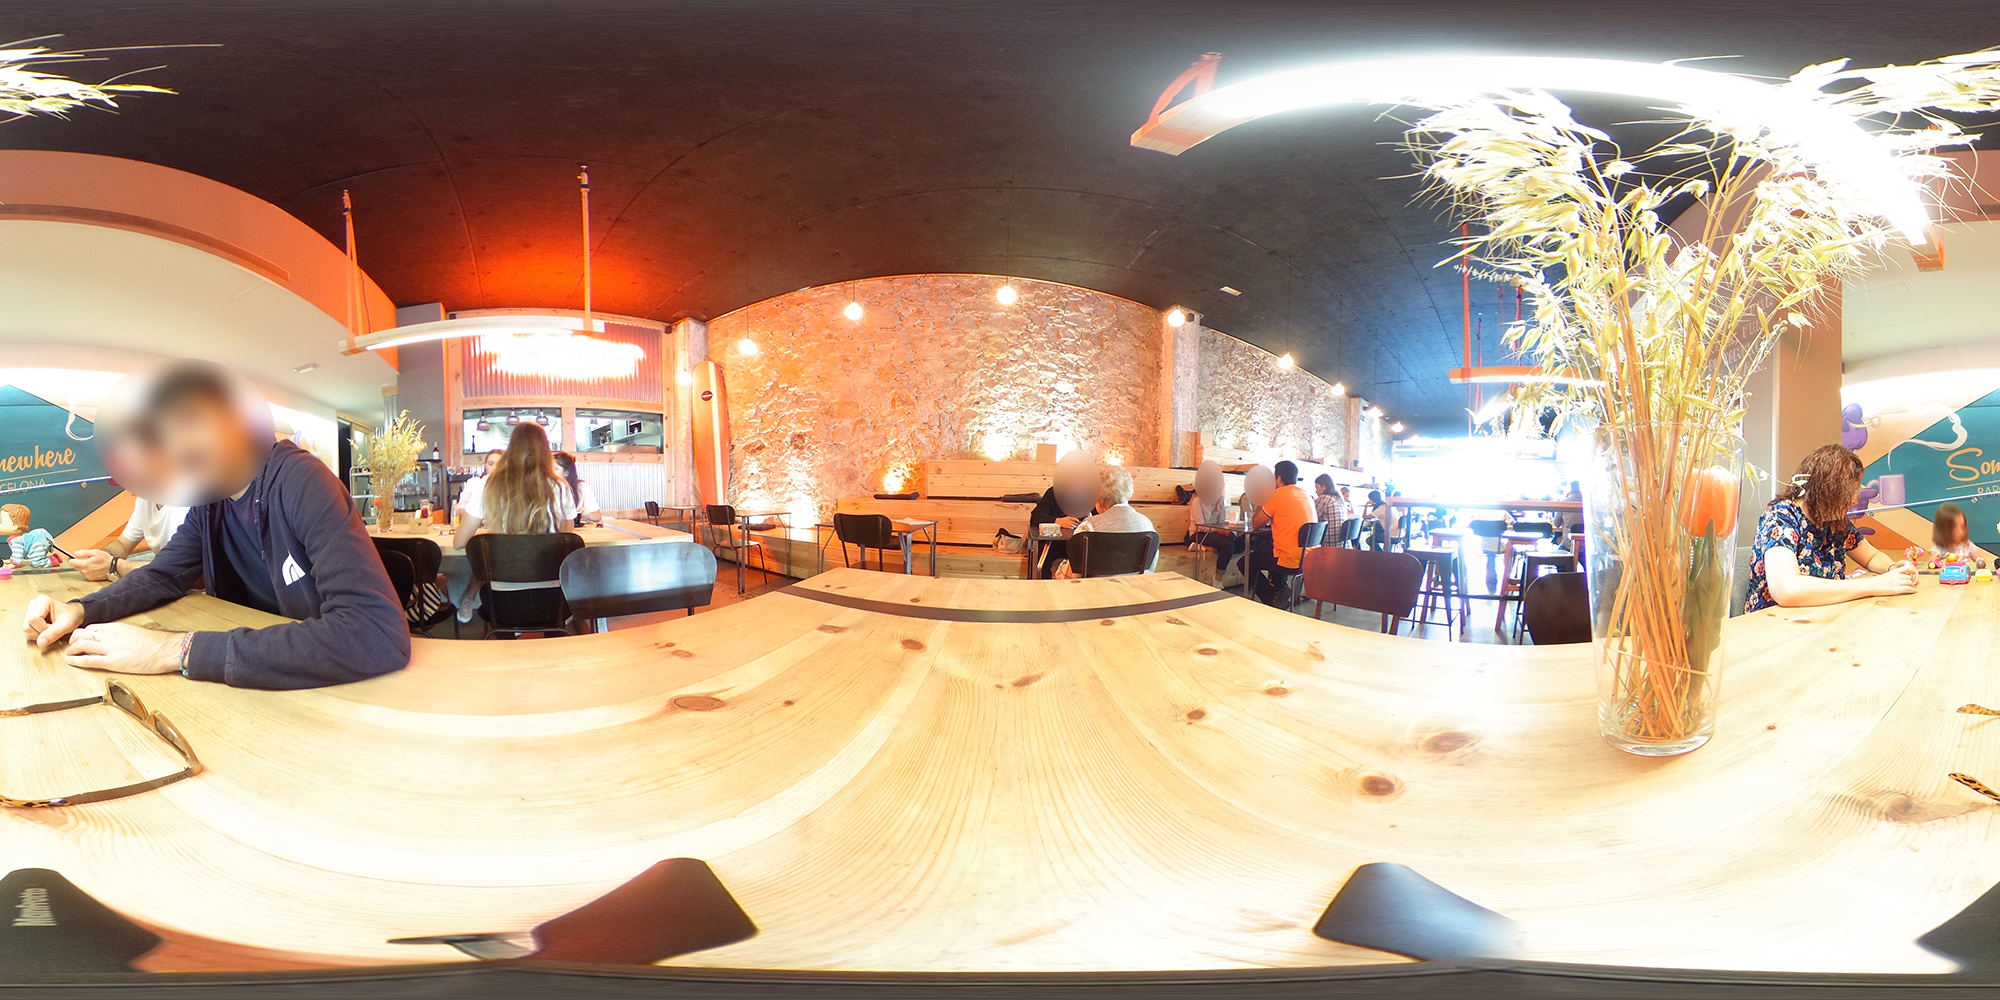 Barcelona cafe.